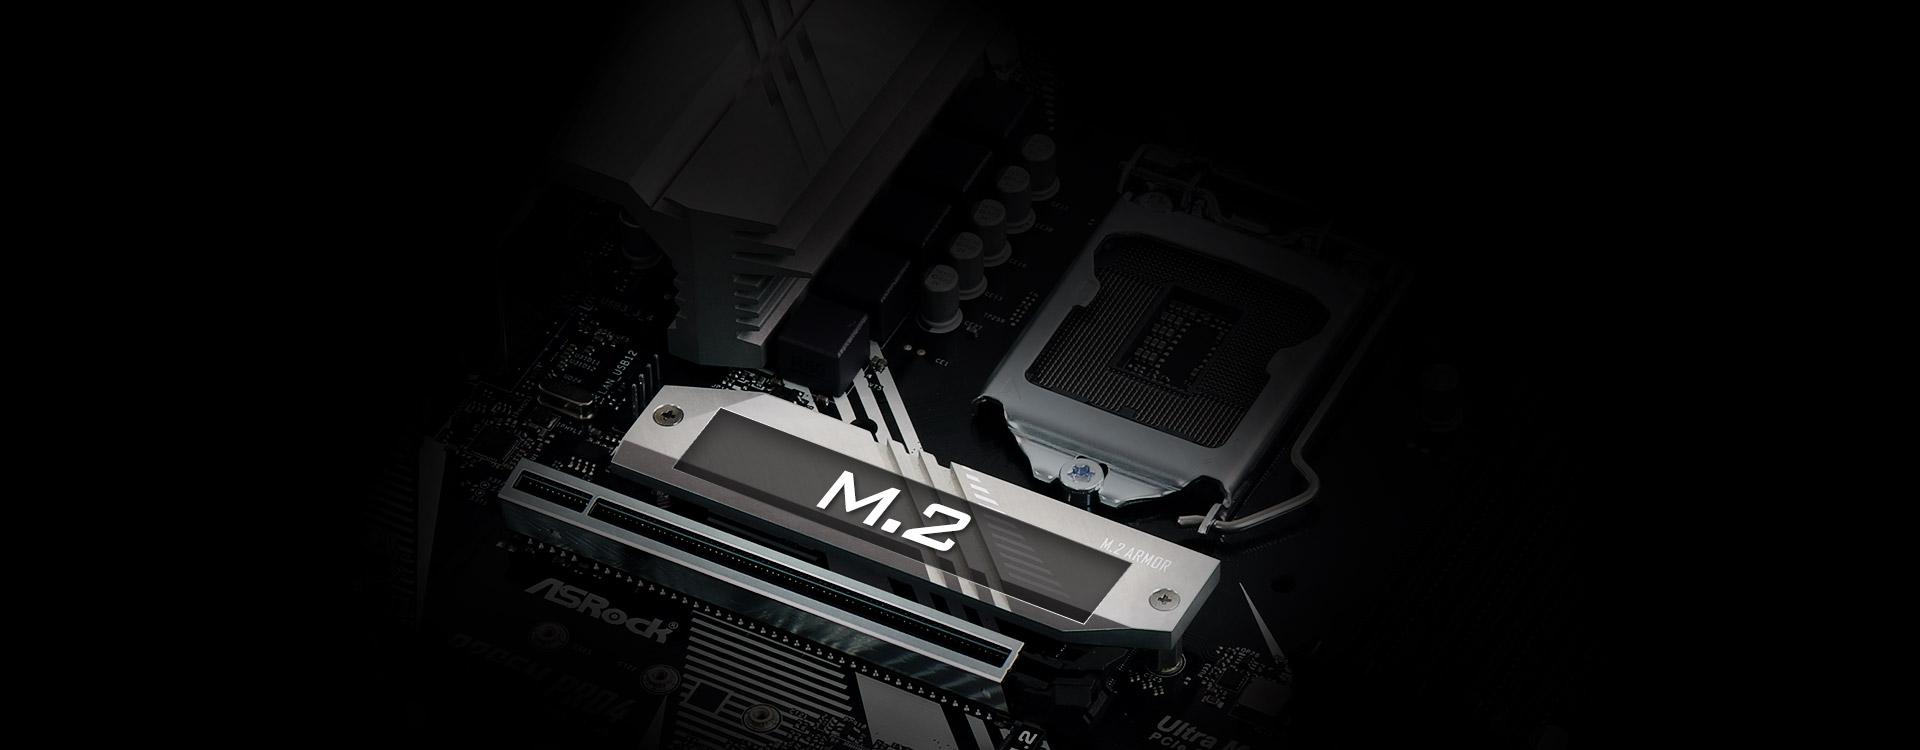 M.2 Slot under the CPU Slot